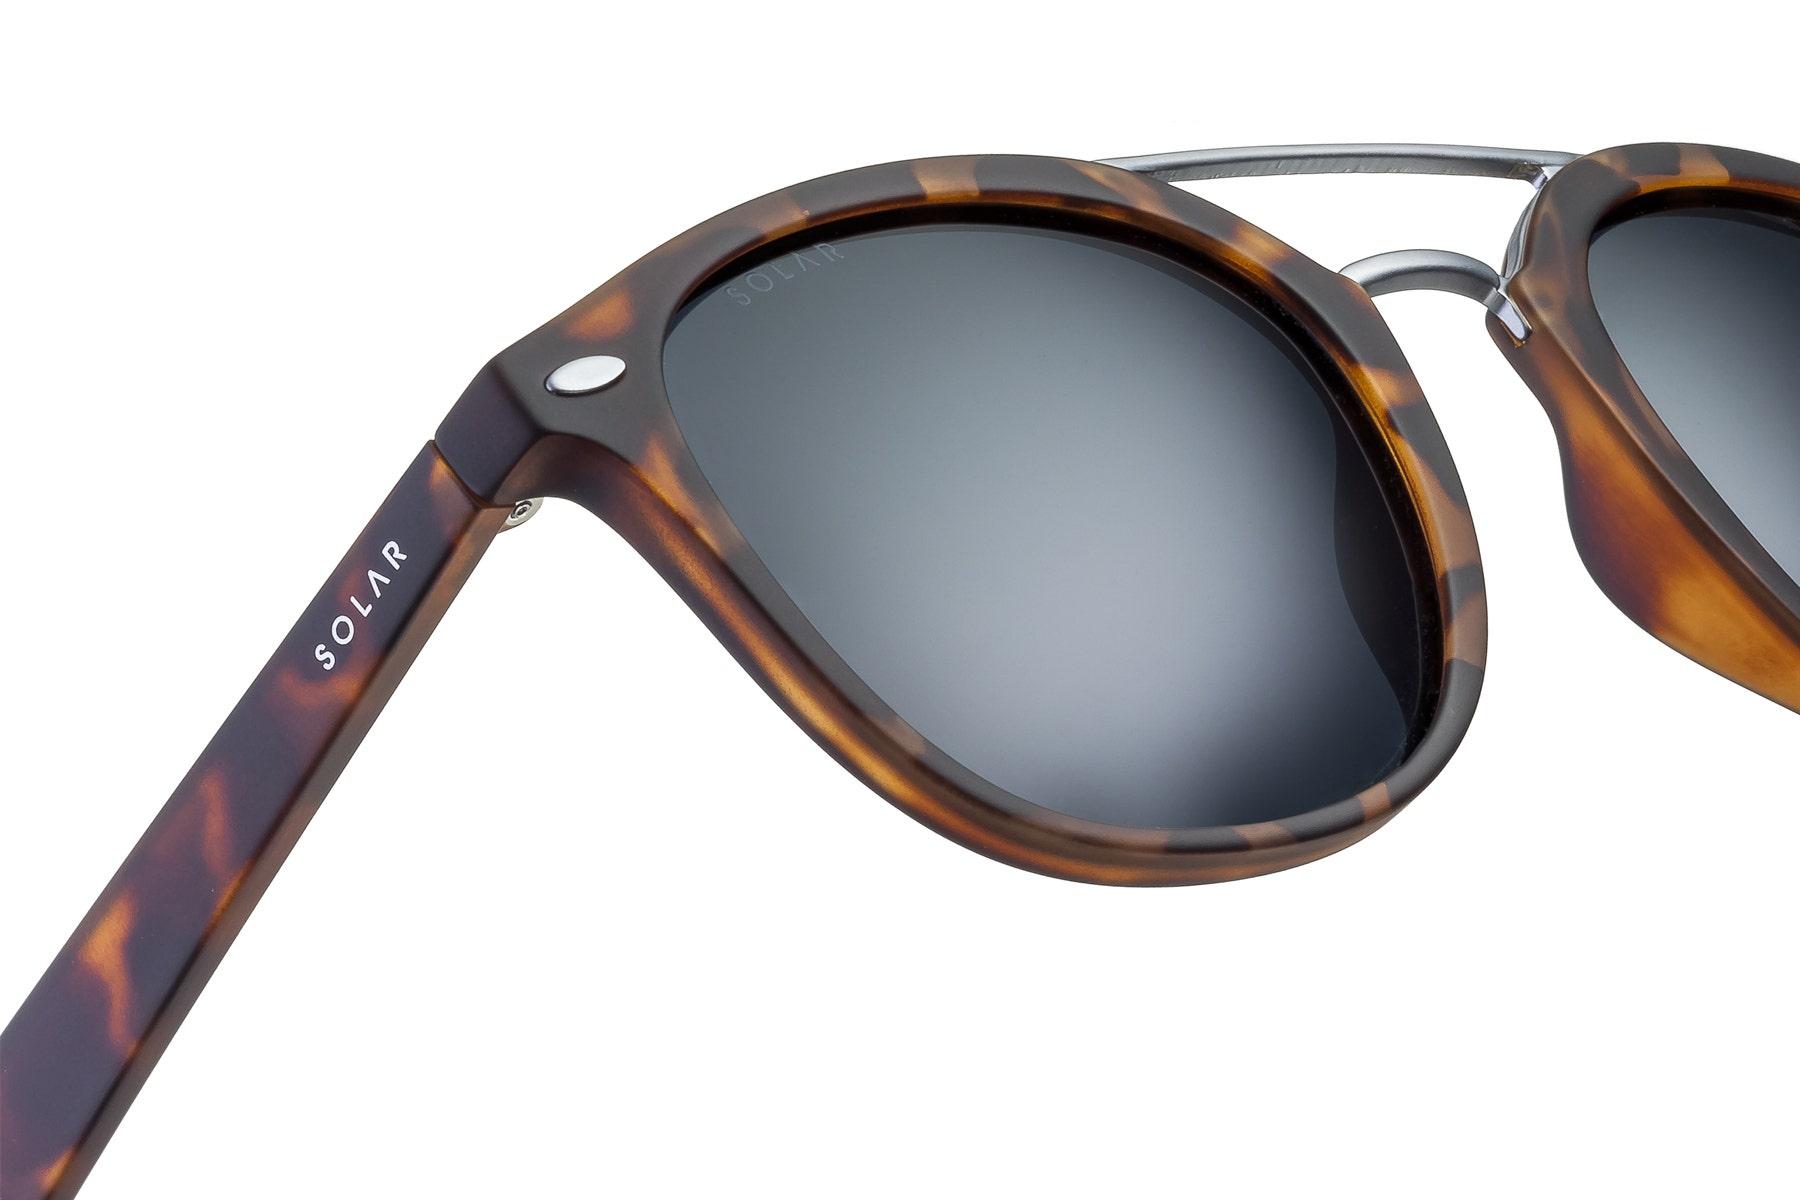 Polarised sunglasses Miller for men